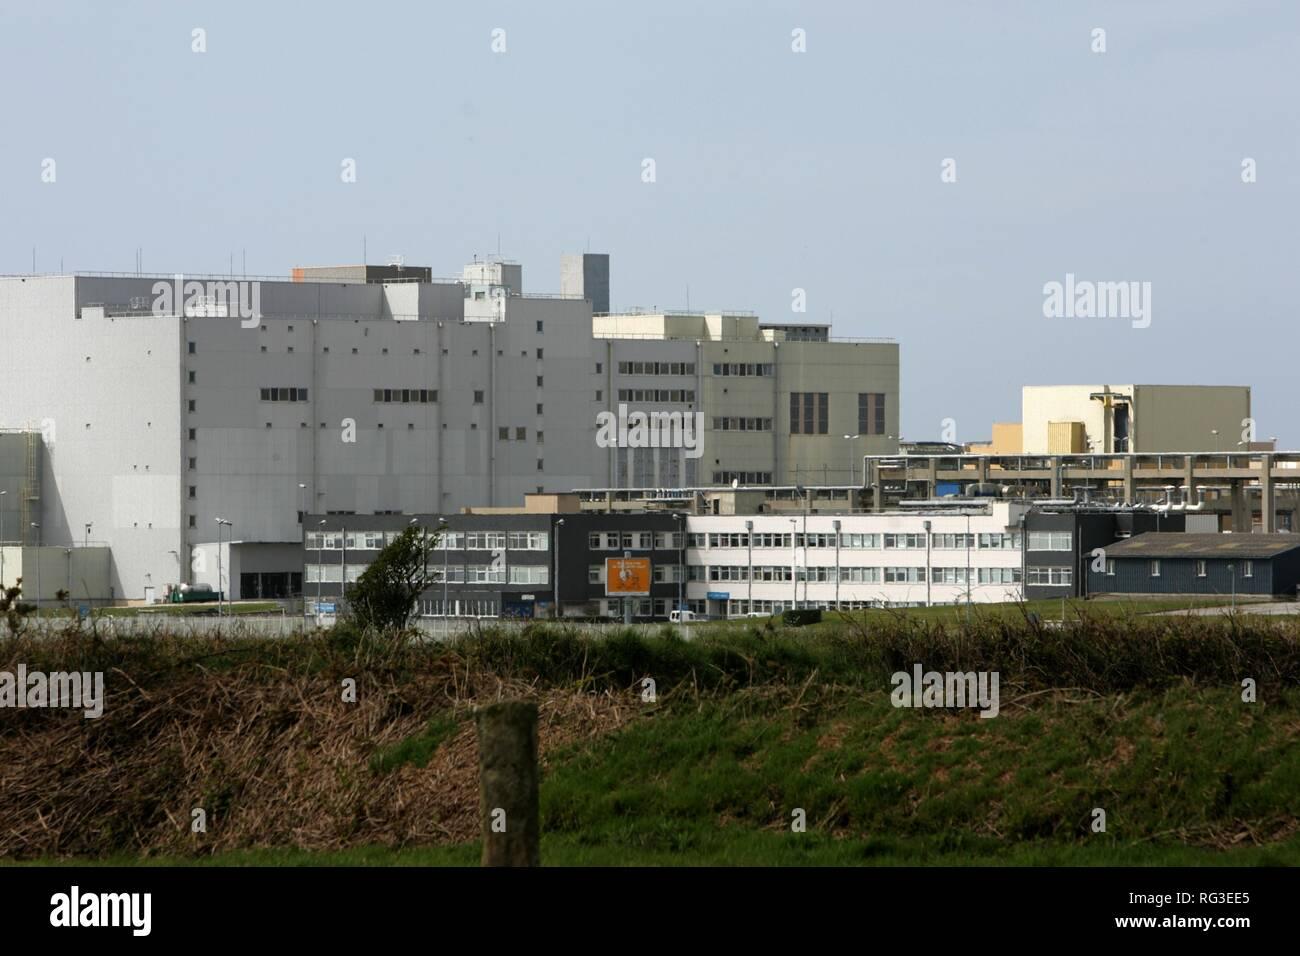 FRA, France, Normandy: COGEMA (Compagnie Generale des Matieres Nucleaires) nuklear reprocessing plant, La Hague. Stock Photo